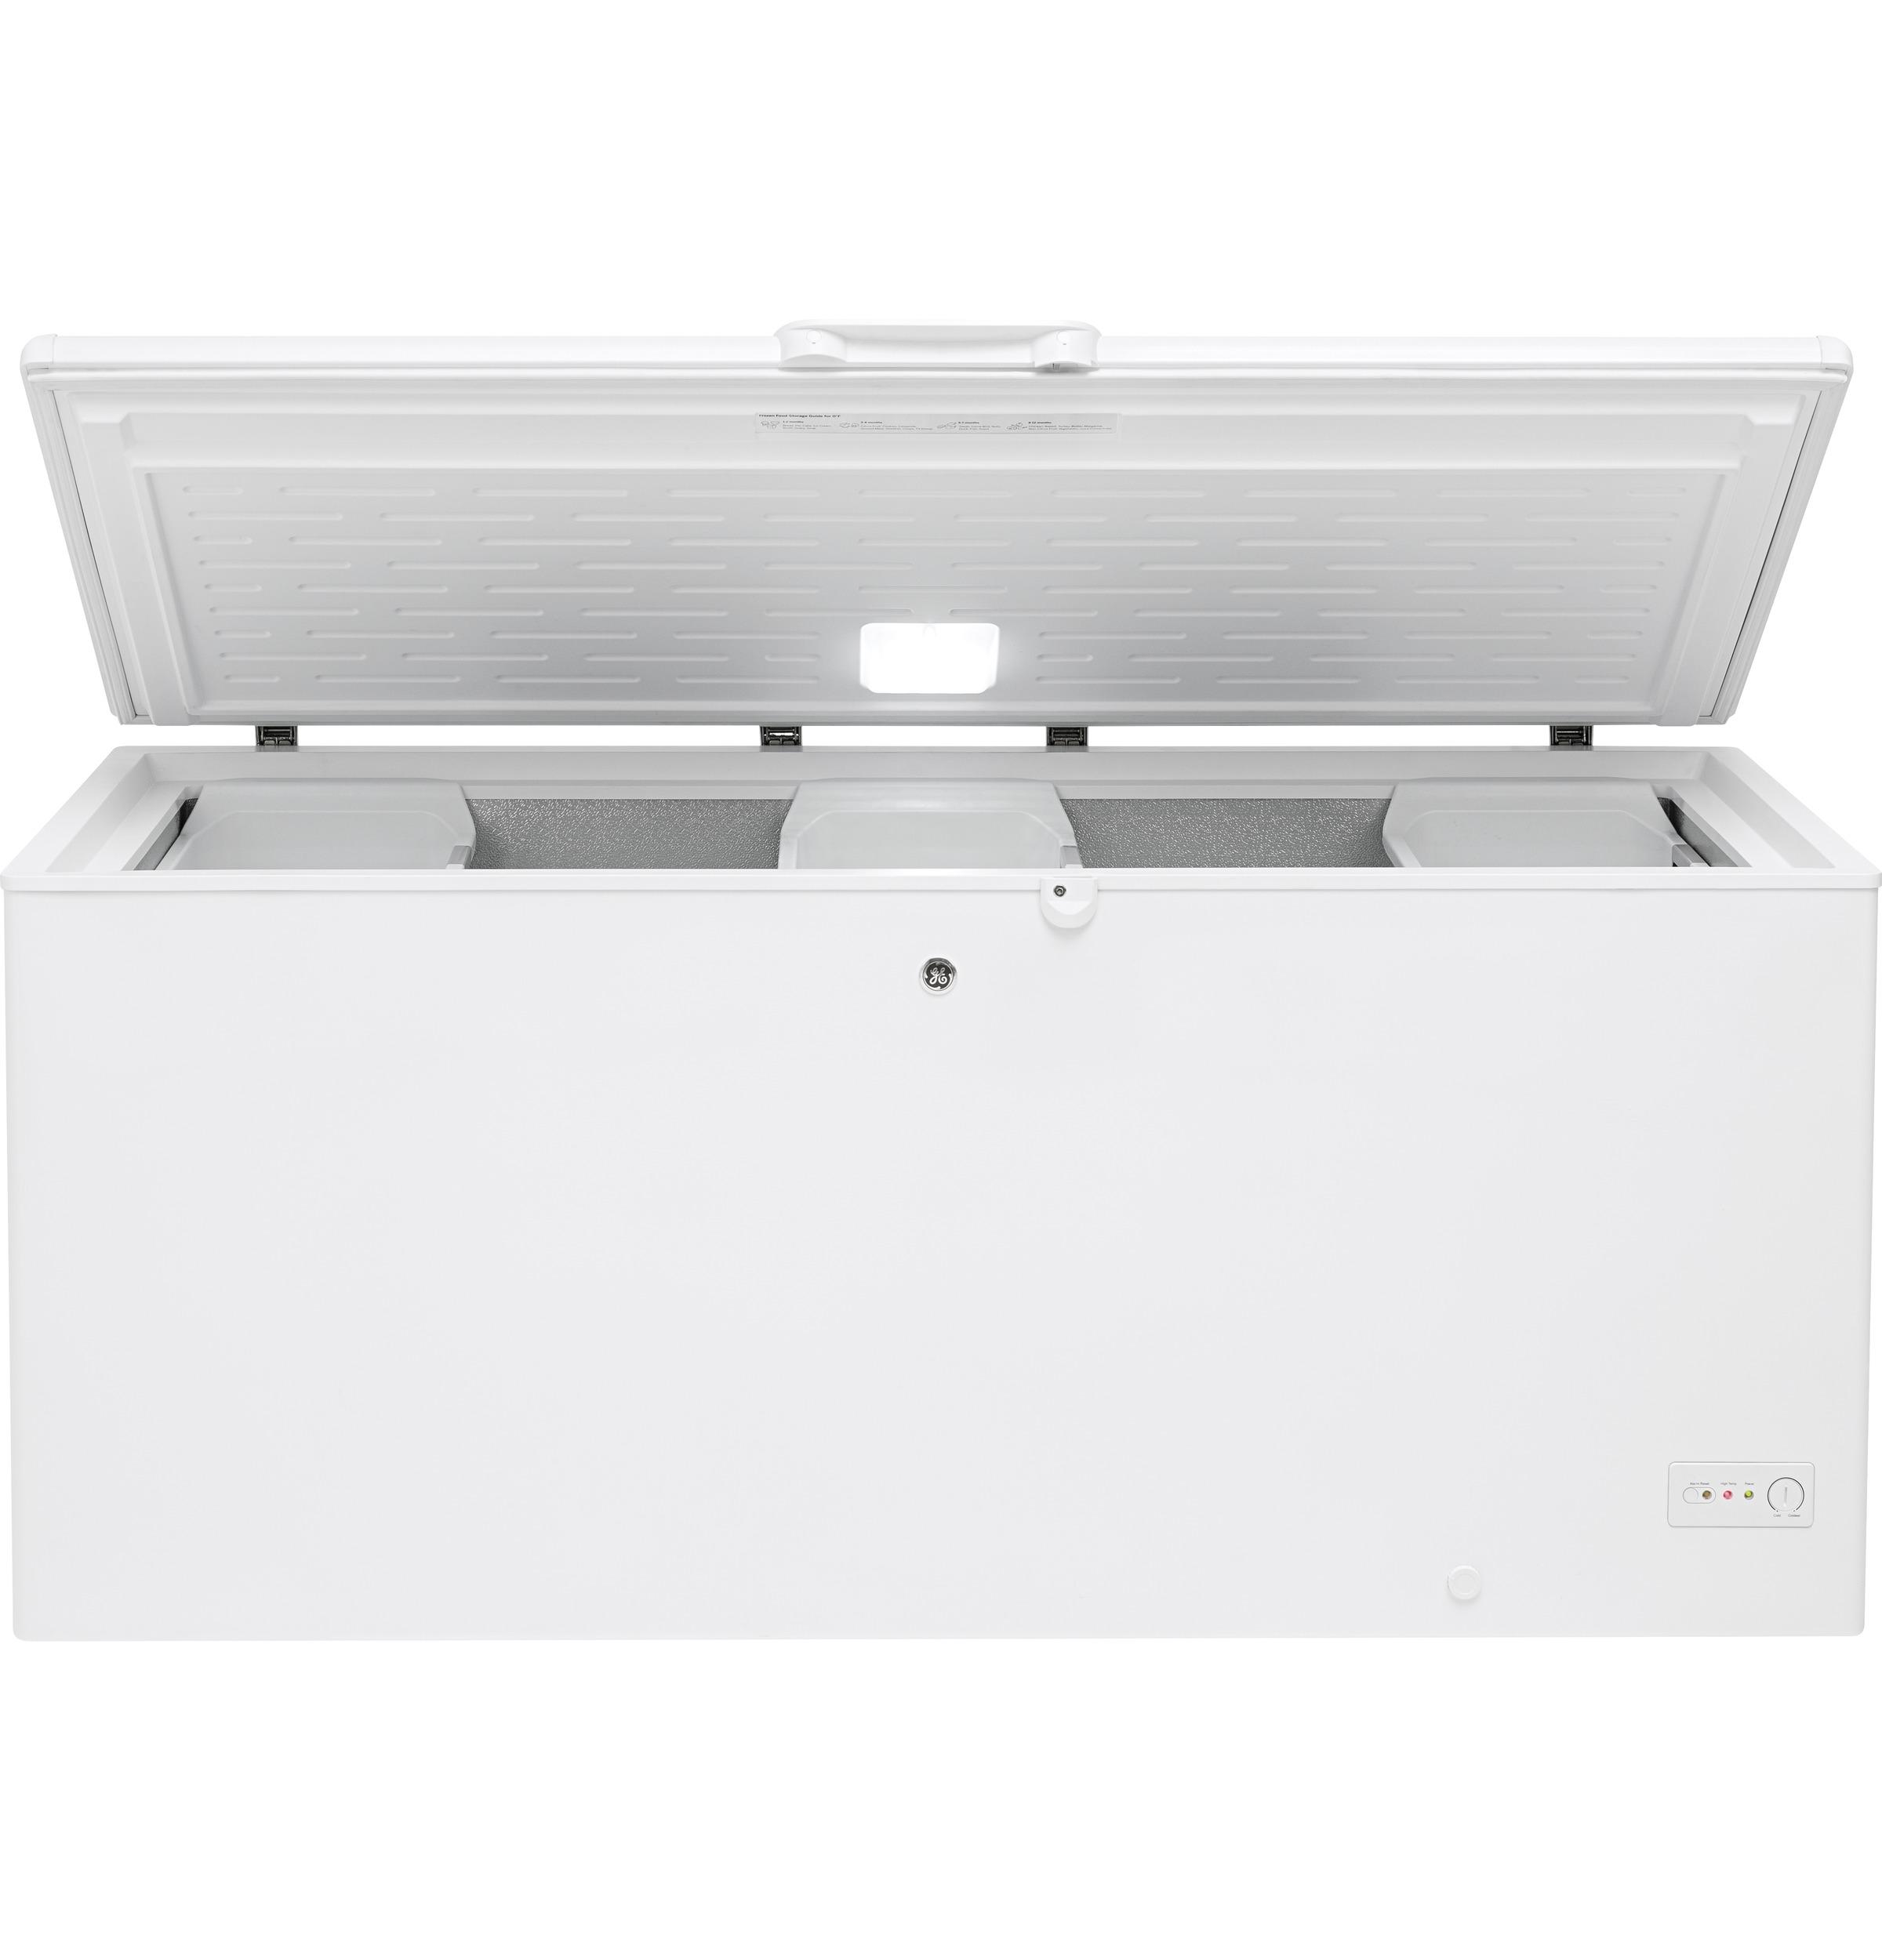 Model: FCM22DLWW | GE® 21.7 Cu. Ft. Manual Defrost Chest Freezer